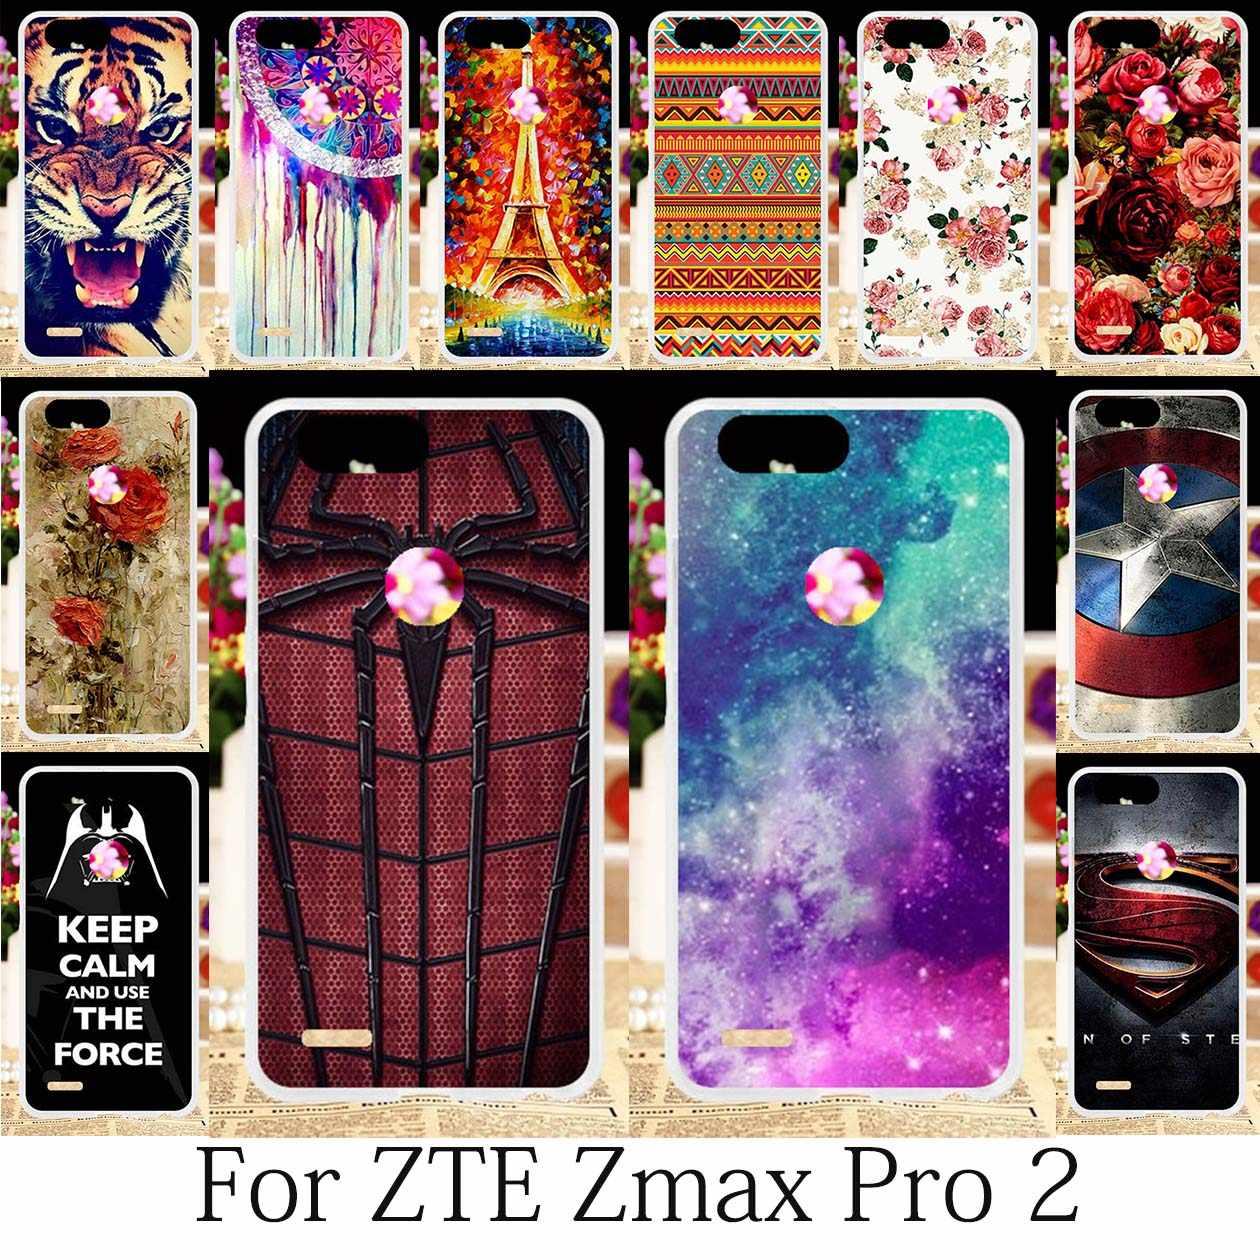 TAOYUNXI Cases For ZTE Sequoia ZTE Blade Z MAX Z982 Case ZTE Zmax Pro 2  Cover Covers Soft Girls Case Coque Anime Housing 6 0inch